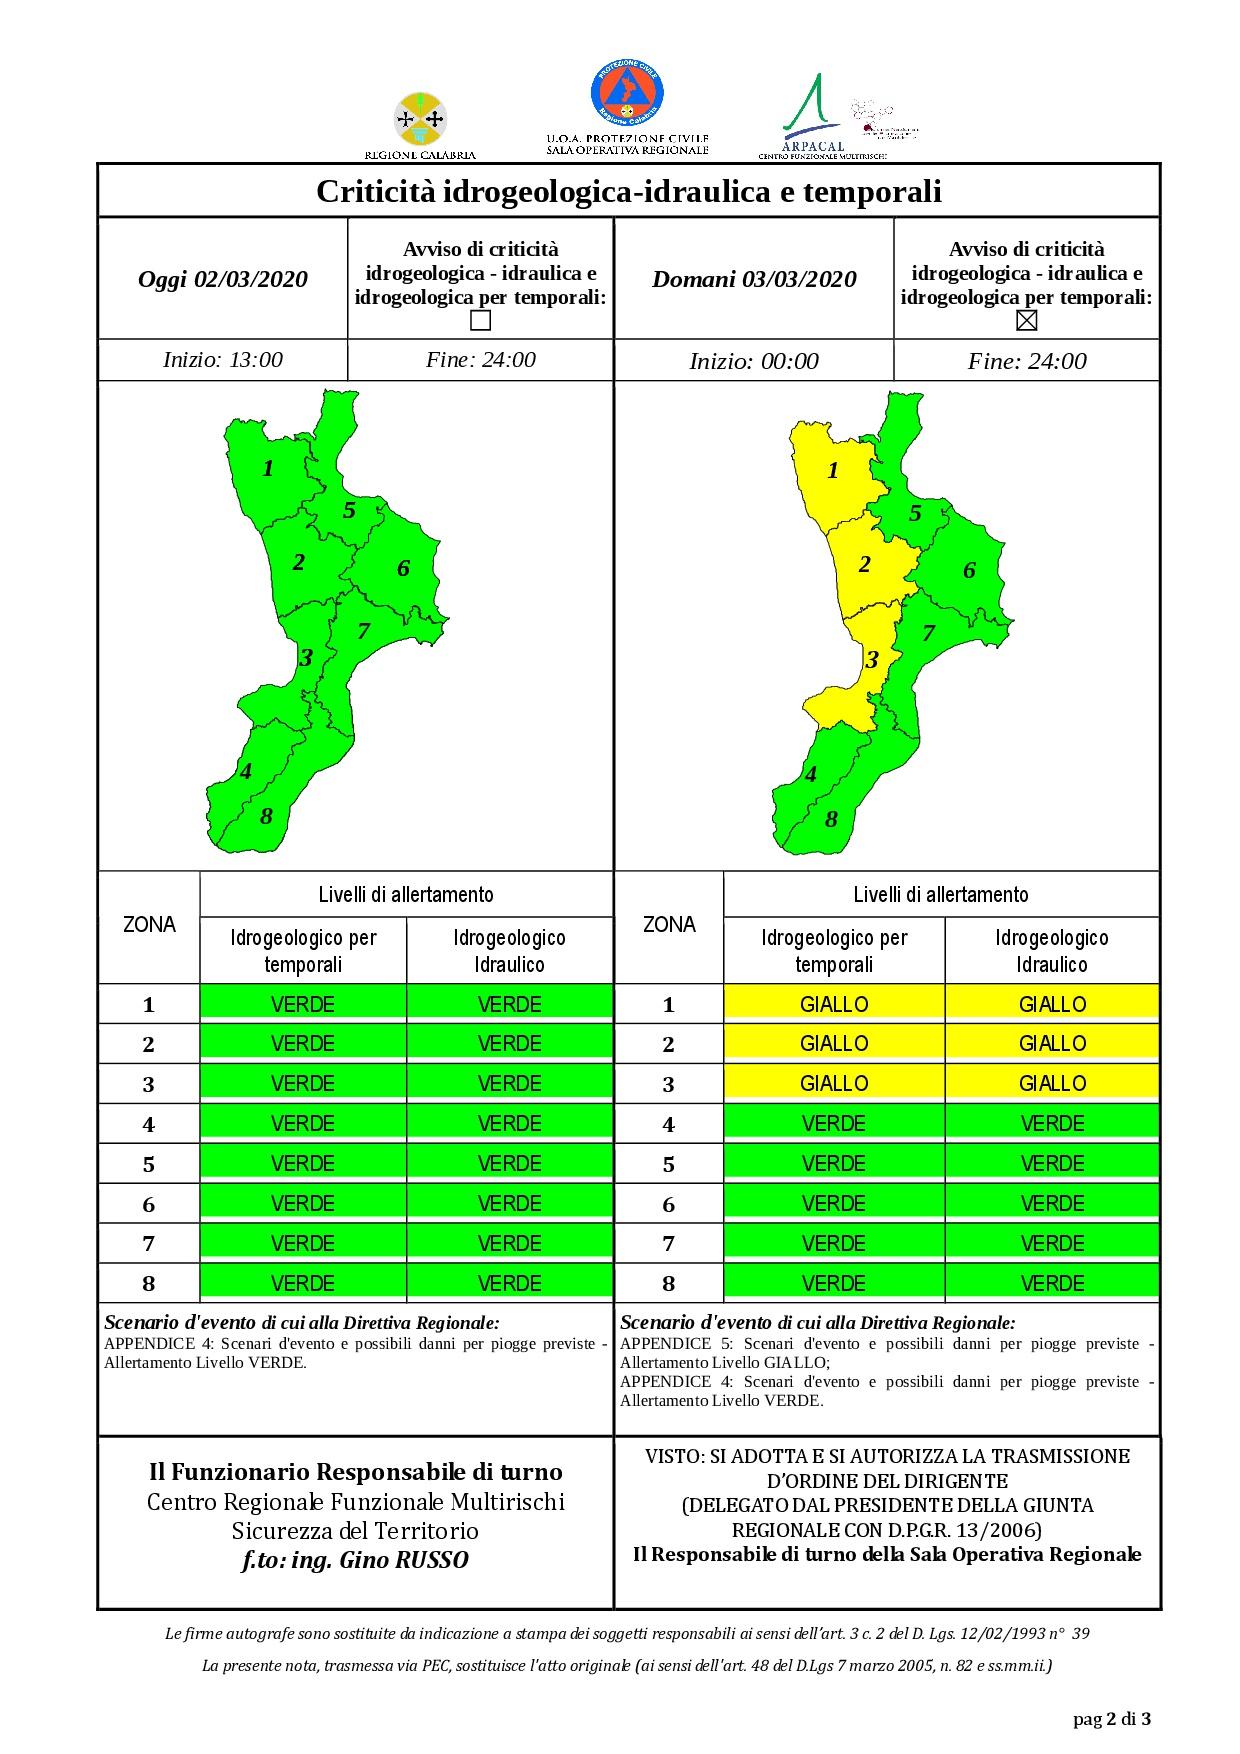 Criticità idrogeologica-idraulica e temporali in Calabria 02-03-2020